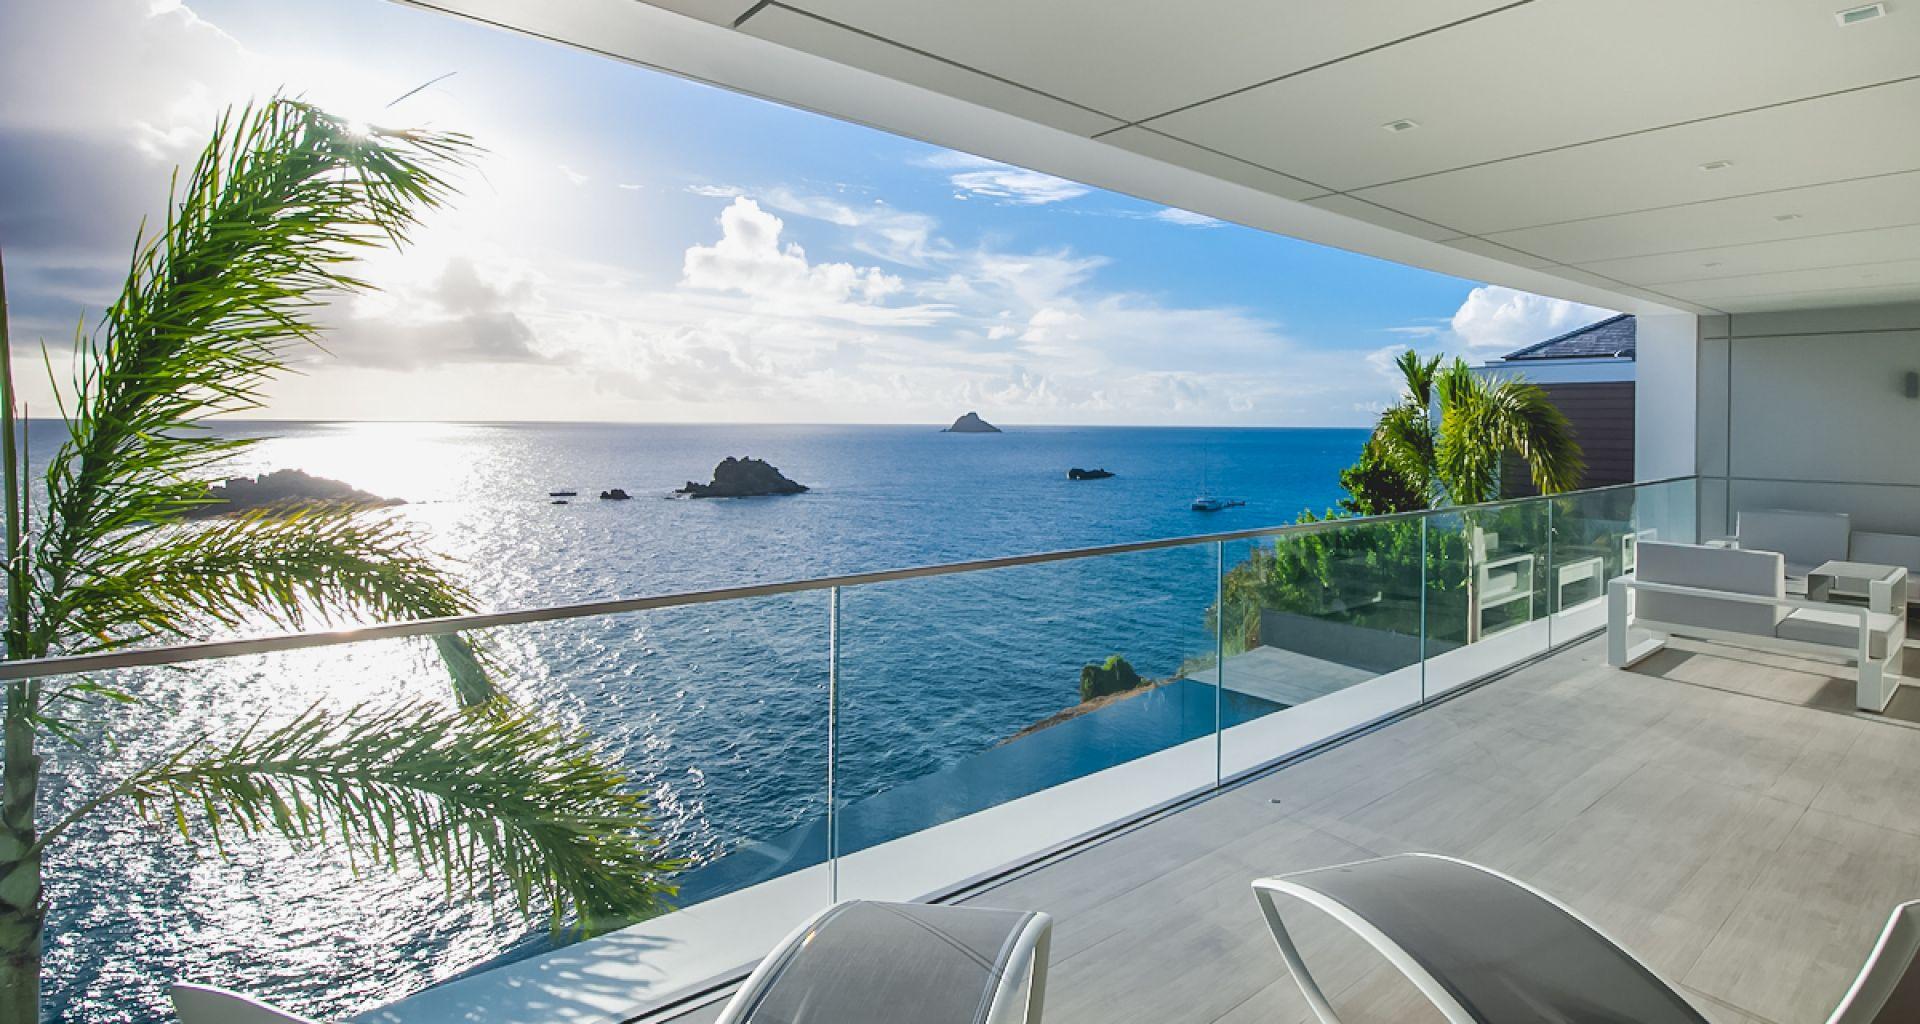 Villa Axel Rocks, St-Barts, Caribbean